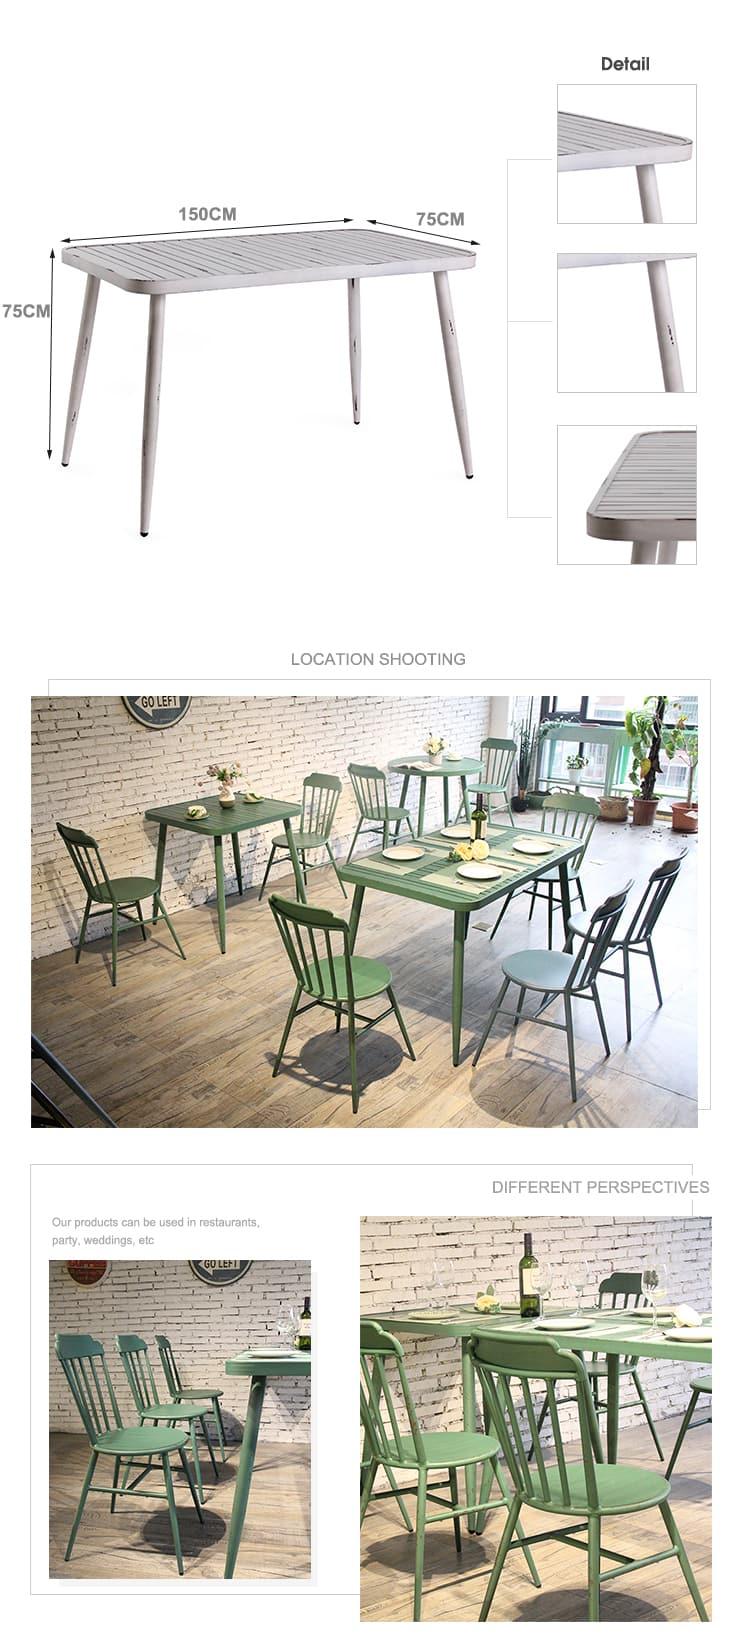 Patio de aluminio impermeable balcón mesa de jardín al aire libre 714DT-ALU-120